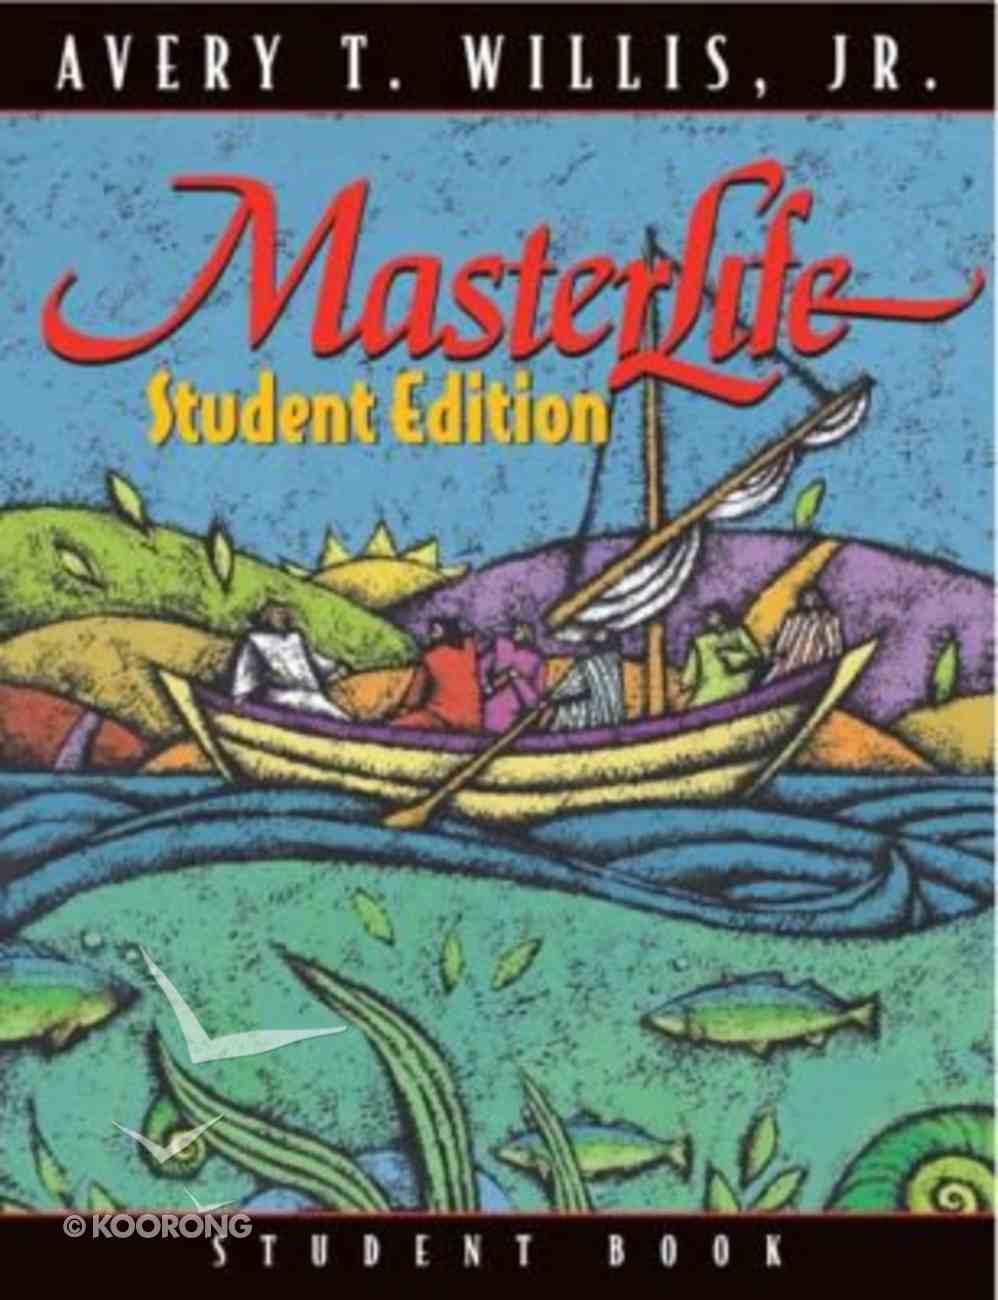 Masterlife Student Edition (Member Book) Paperback